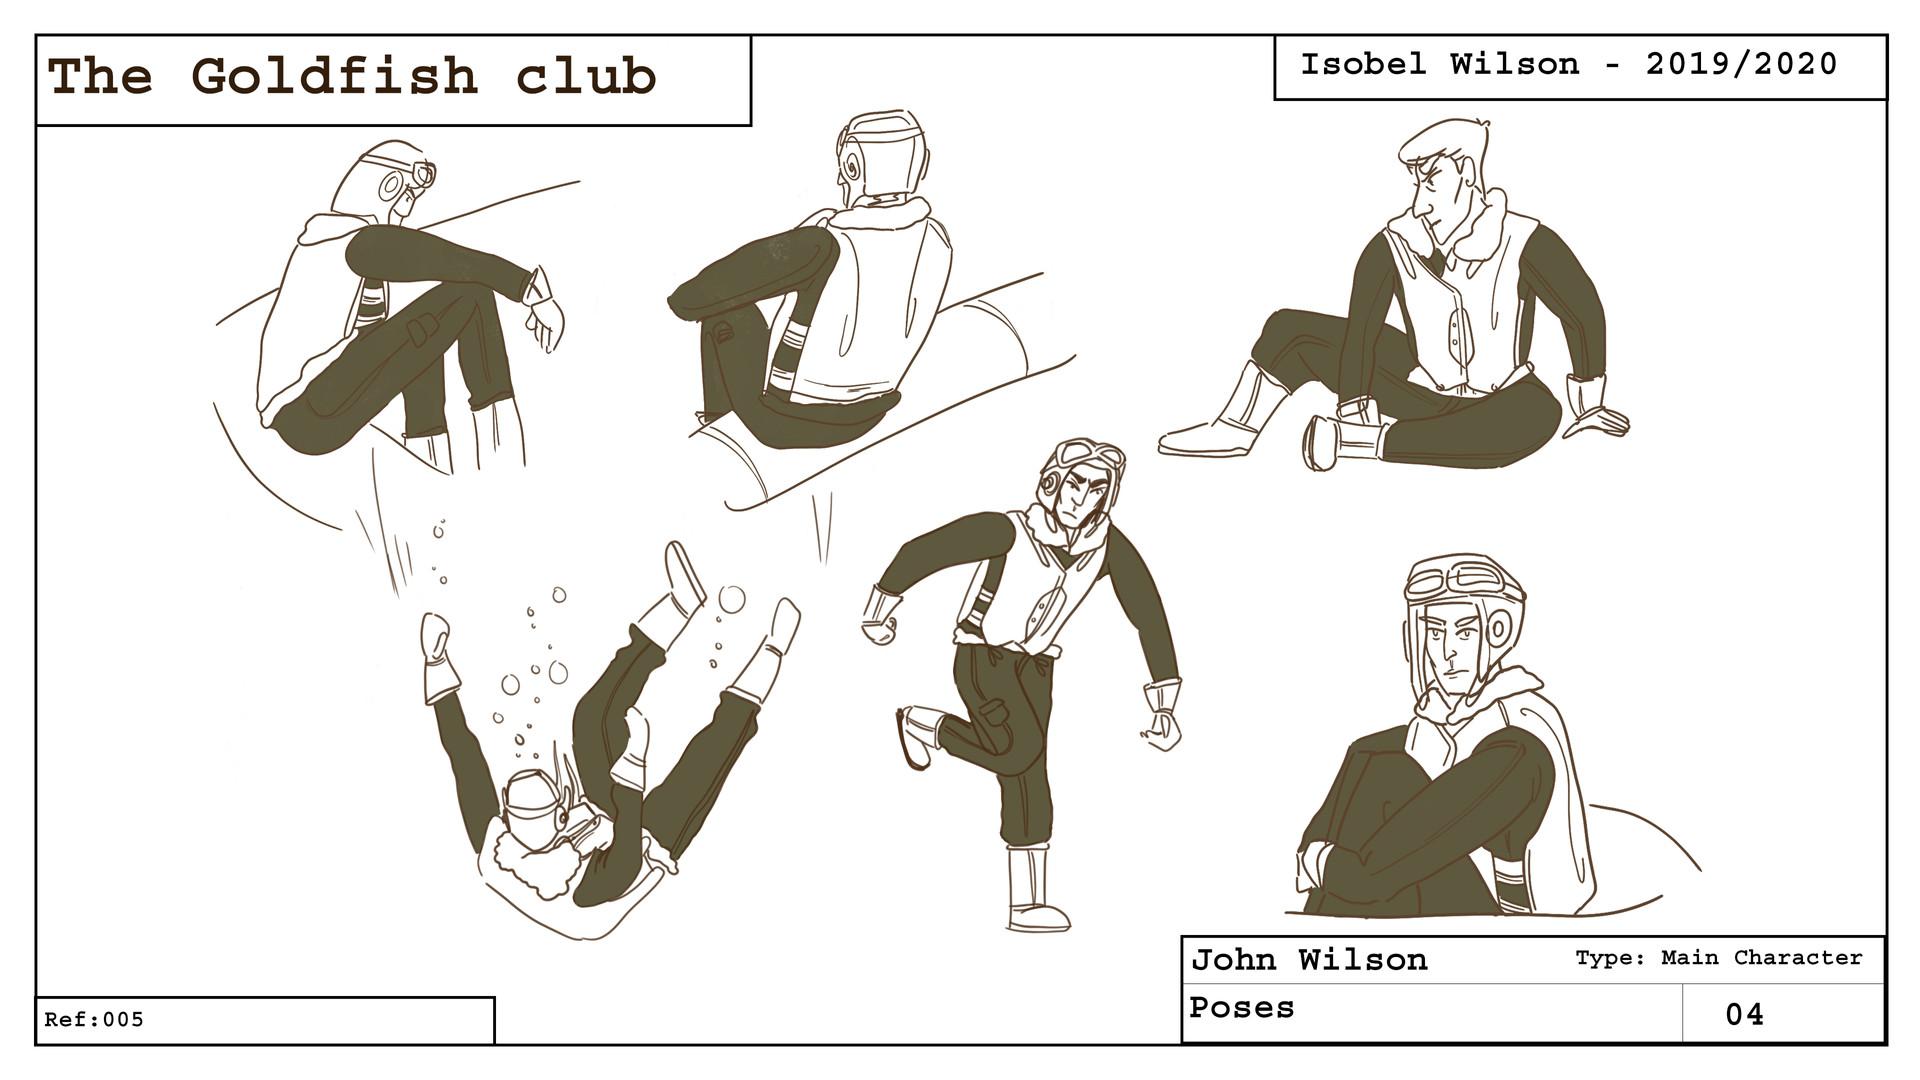 John - Character poses